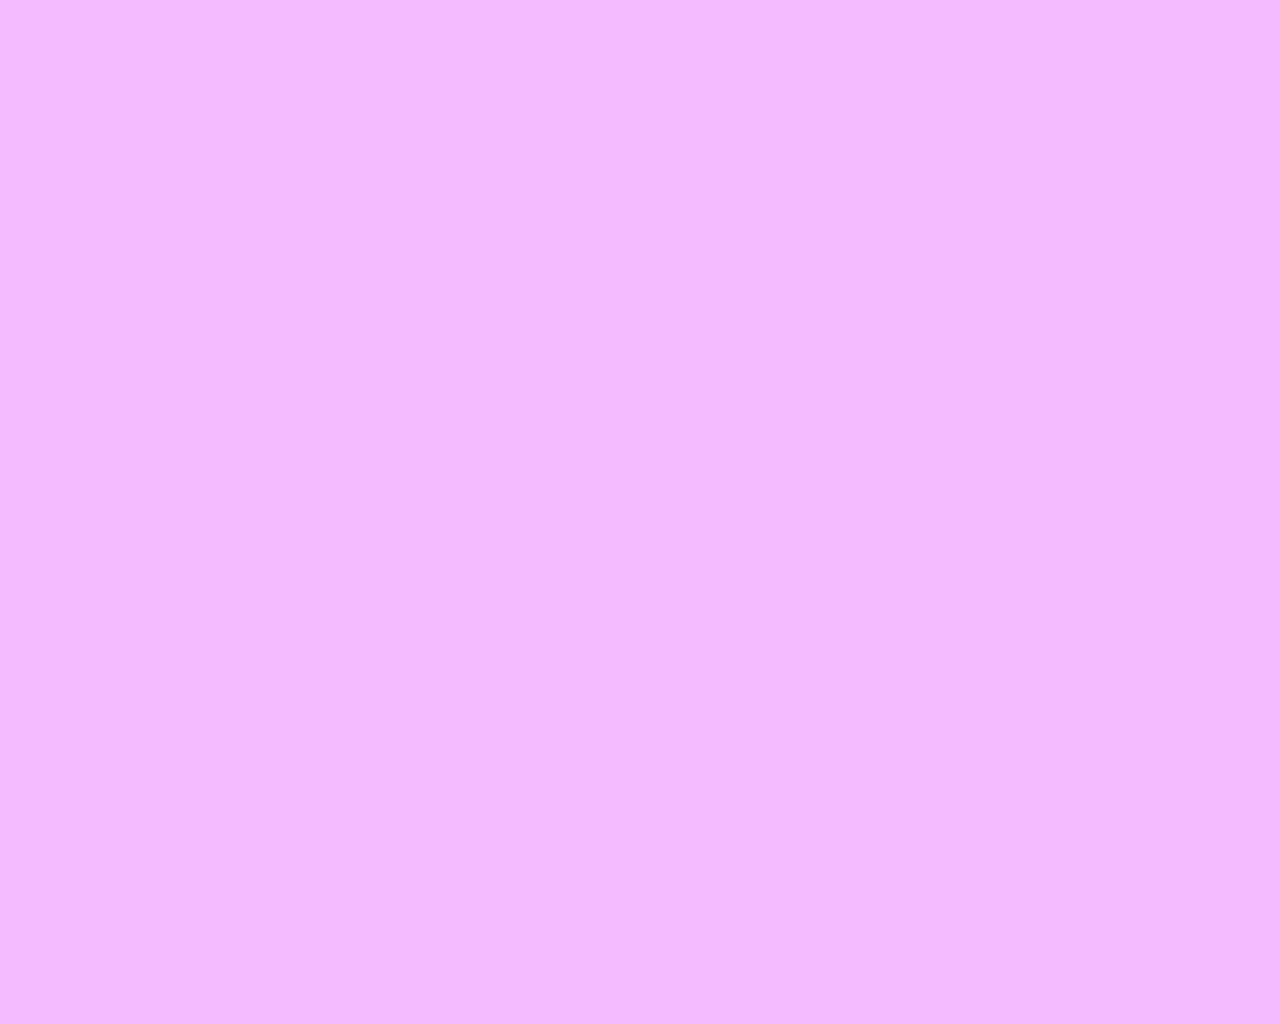 1280x1024 Brilliant Lavender Solid Color Background